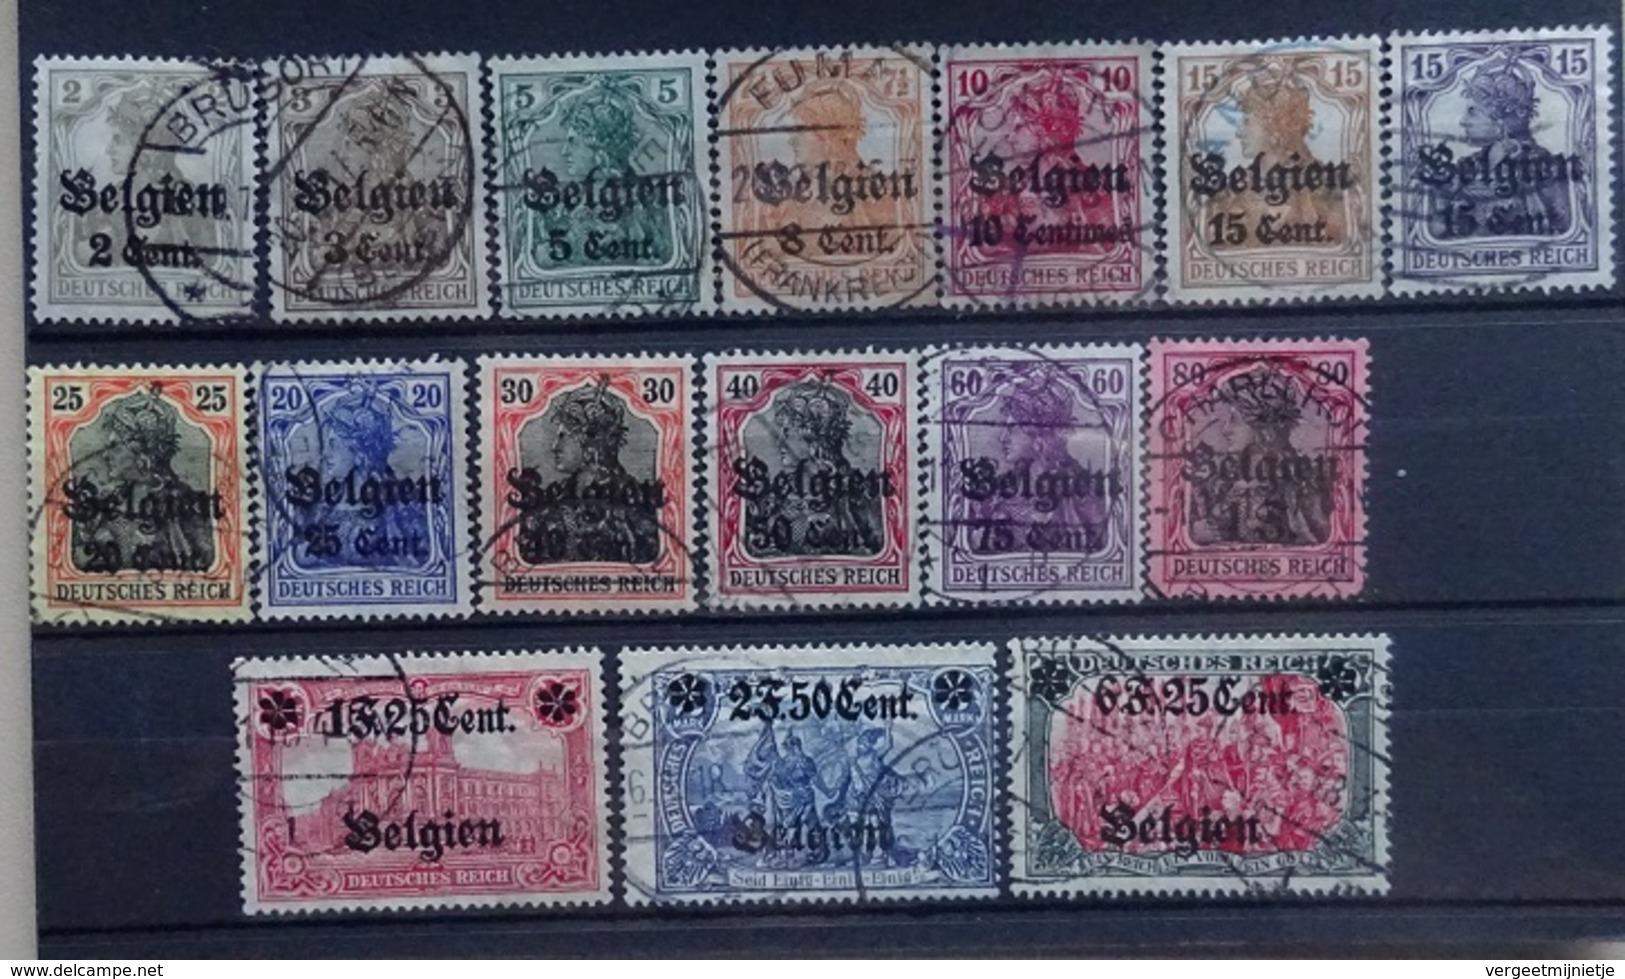 BELGIE  Bezettingszegels   1916  OC  10 - 25    Gestempeld  CW 185,00 - Guerre 14-18